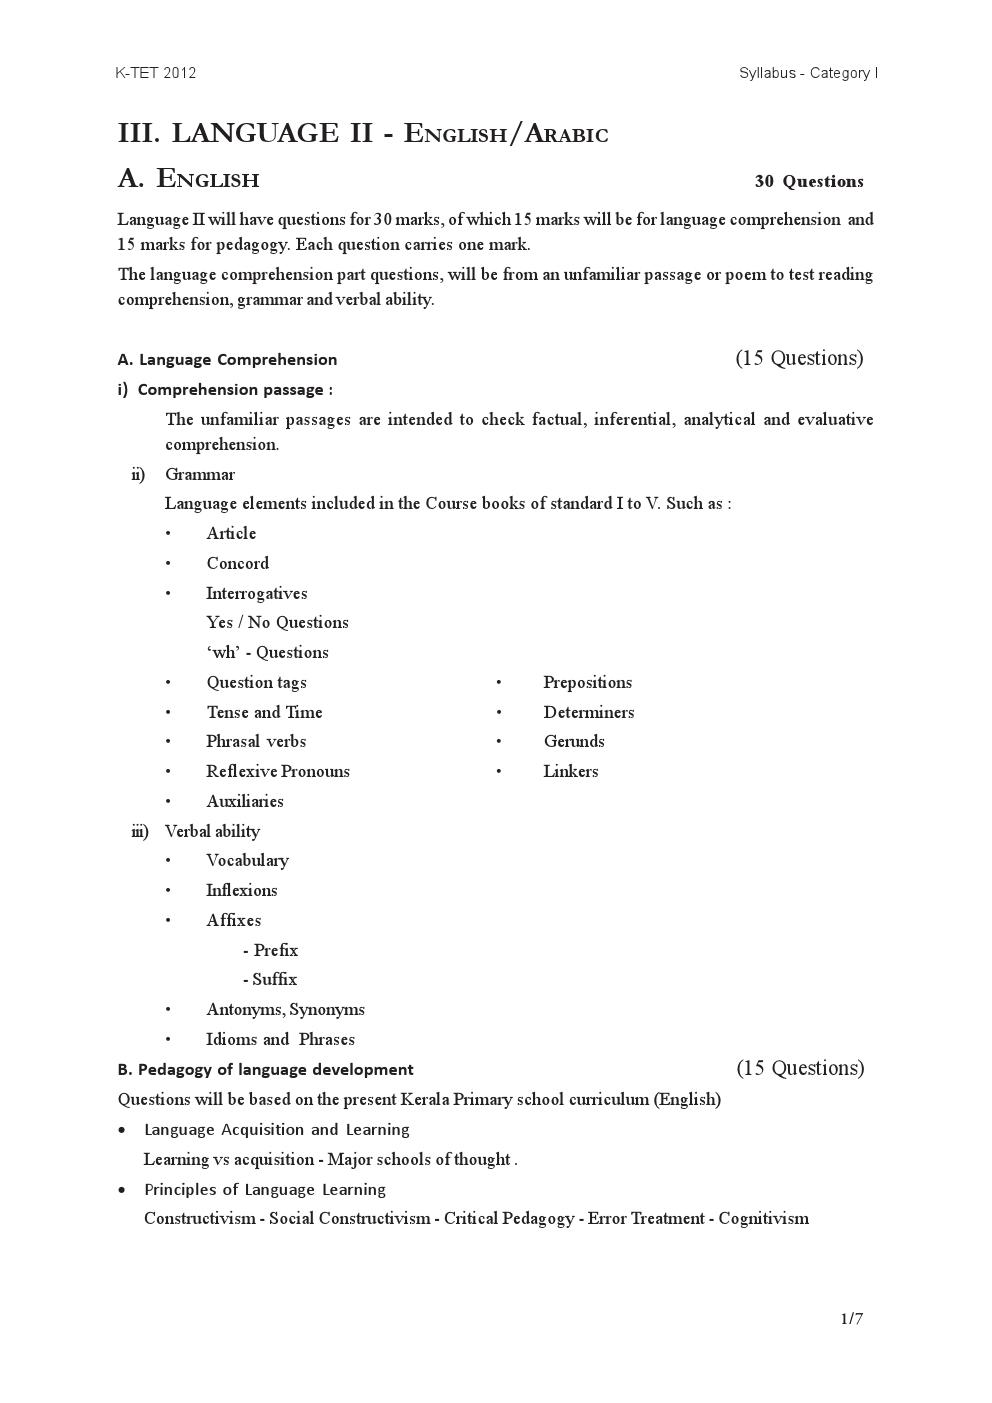 http://masterstudy.net/pdf/syllabus10007.jpg